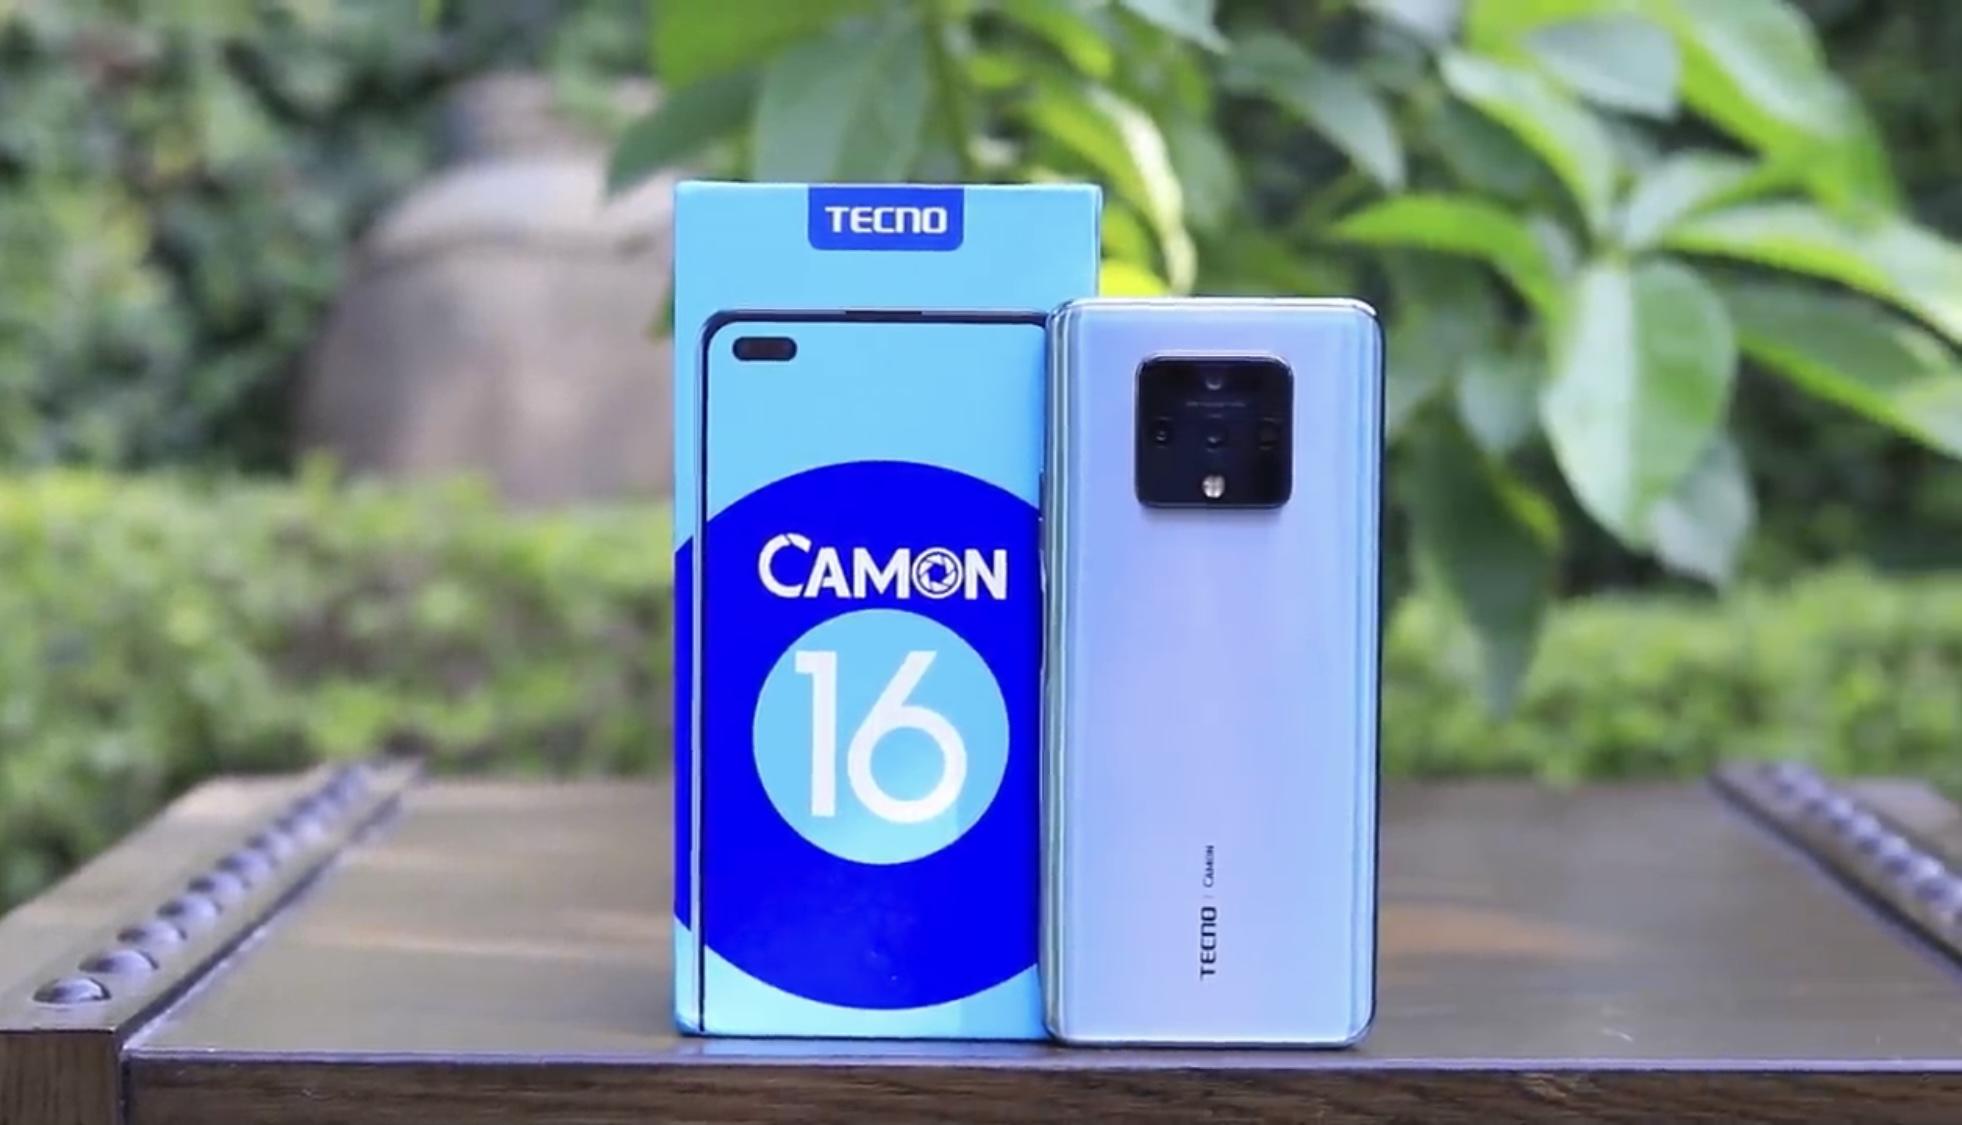 Tecno Camon 16 Price in Pakistan and Specs